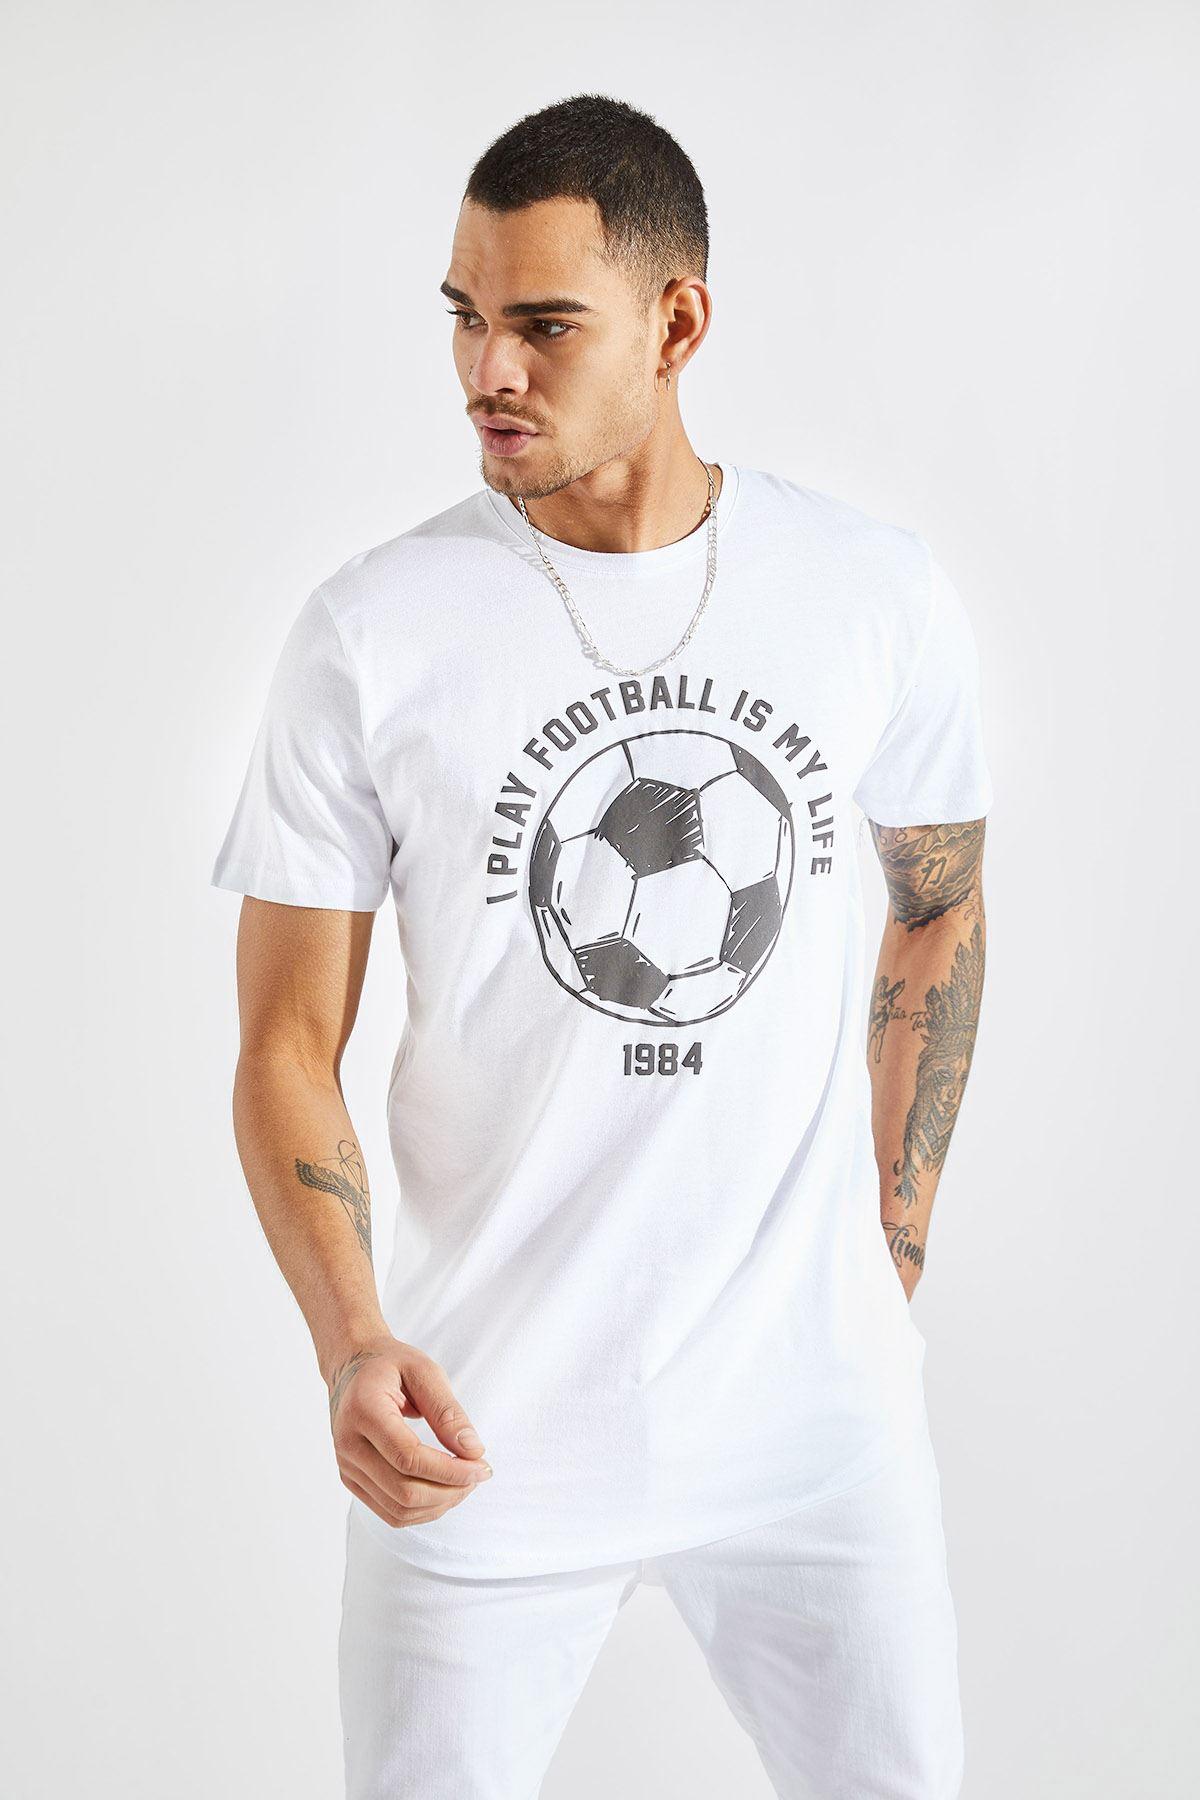 Erkek I Play Football Baskı Beyaz Tişört